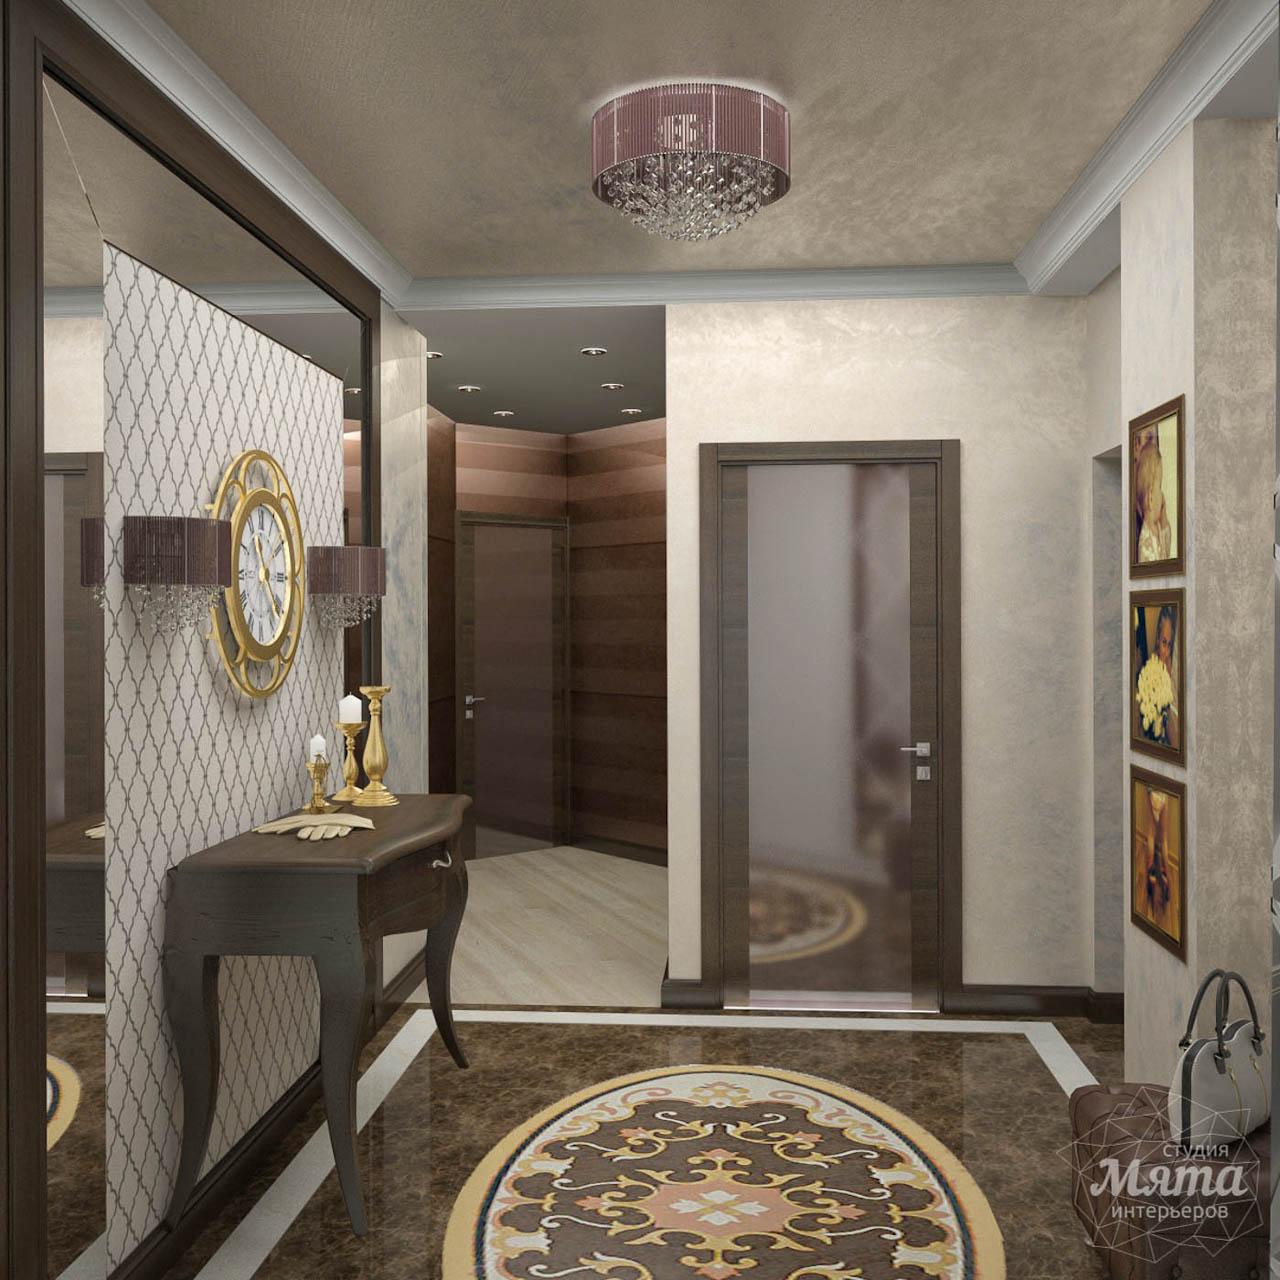 Дизайн интерьера и ремонт трехкомнатной квартиры по ул. 8 Марта 190 img1889809307